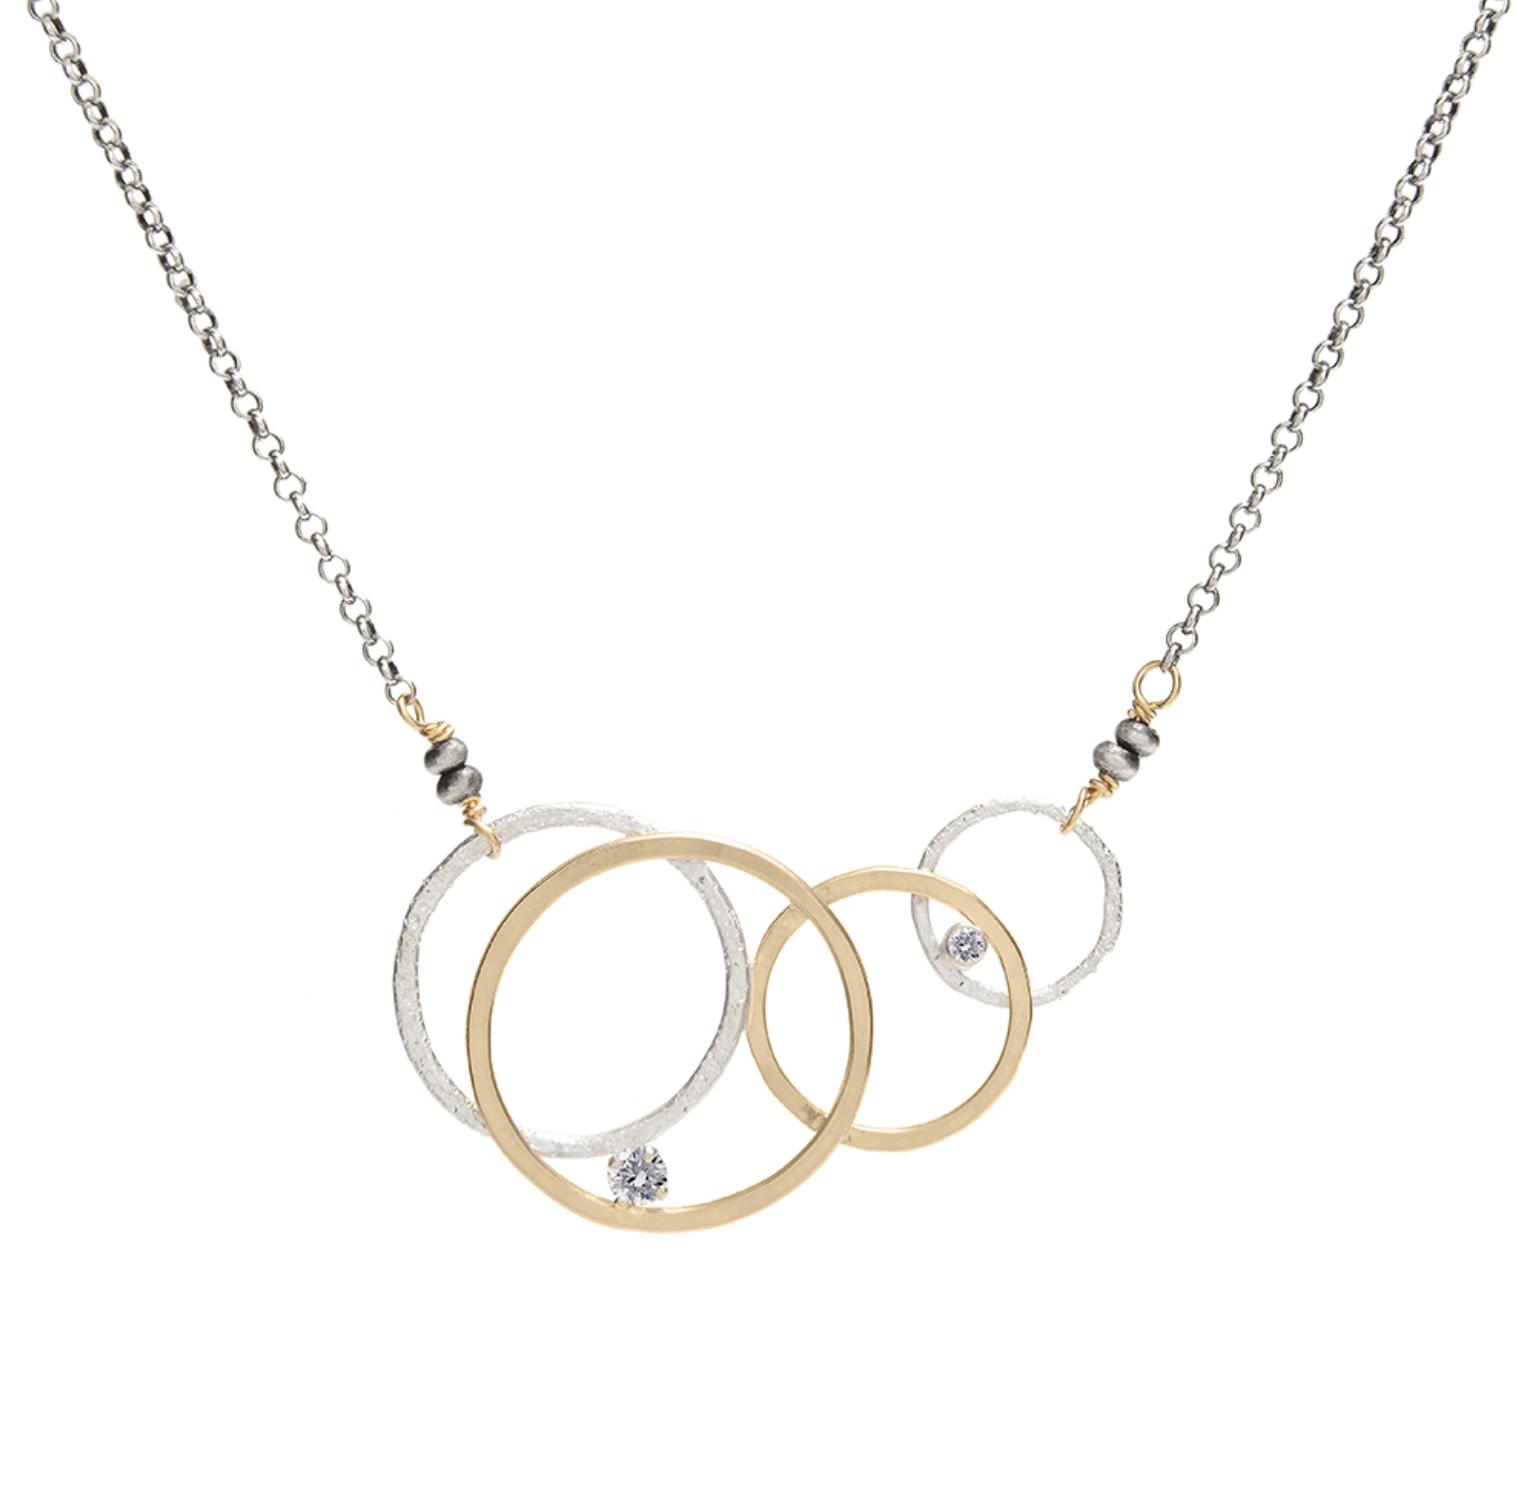 J&I Circles Necklace